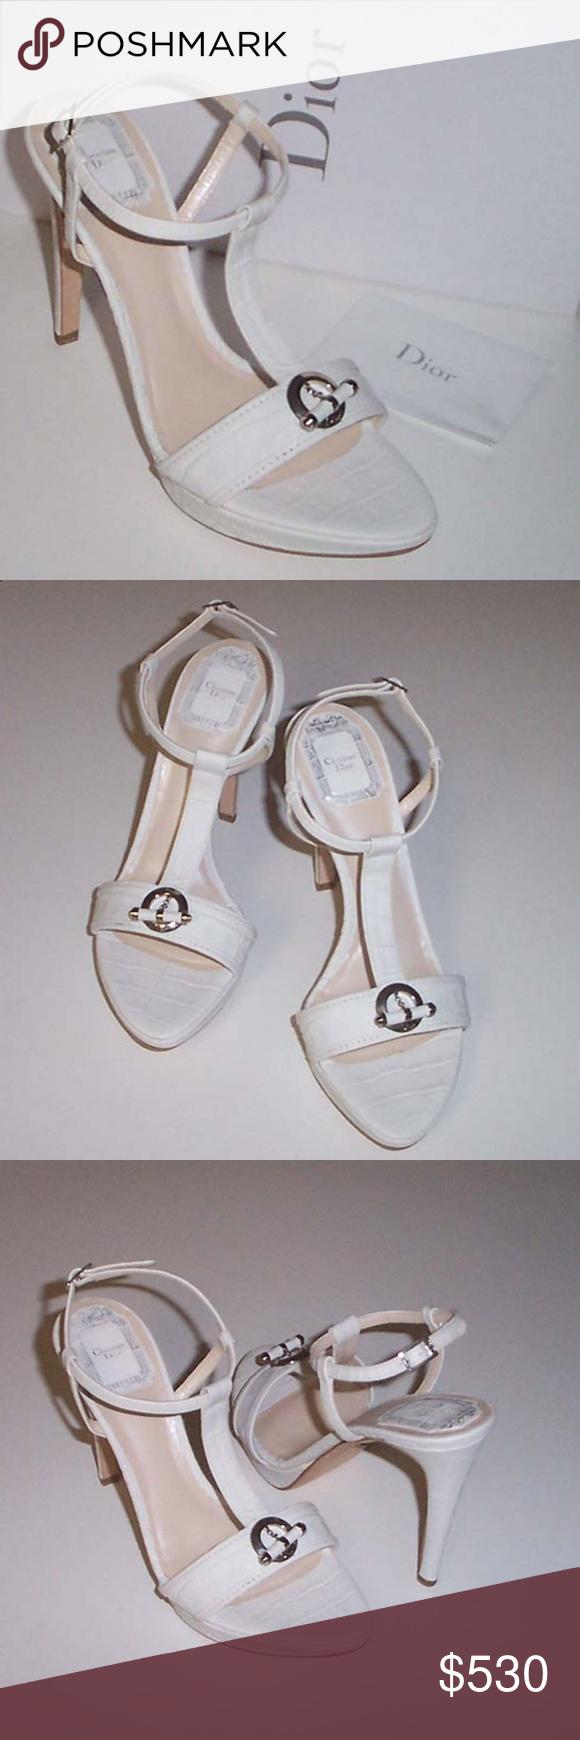 9947f84165fff6 NEW DIOR croc print T-strap platform sandal 37.5 CHRISTIAN DIOR white croc-embossed  leather upper